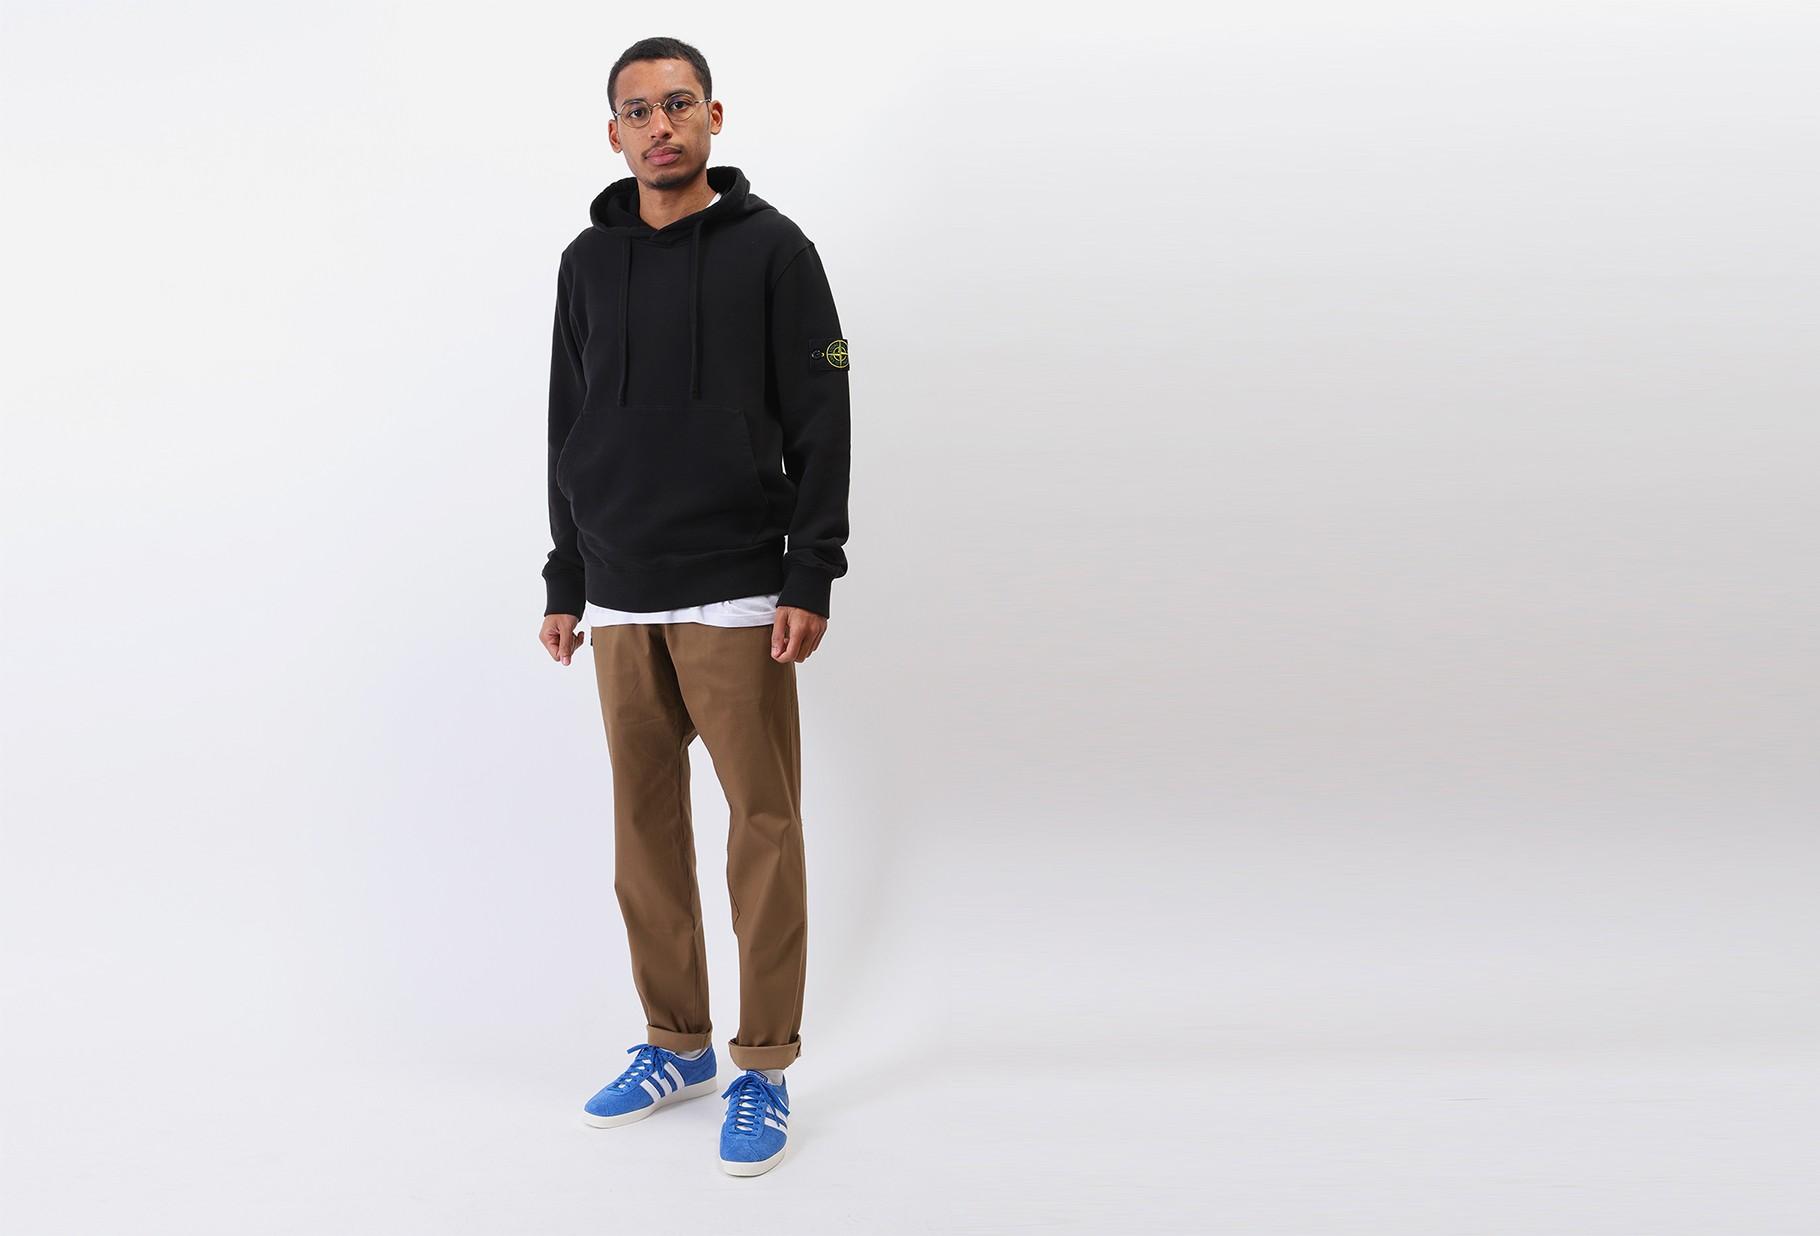 STONE ISLAND / 64120 hooded sweater v0029 Nero